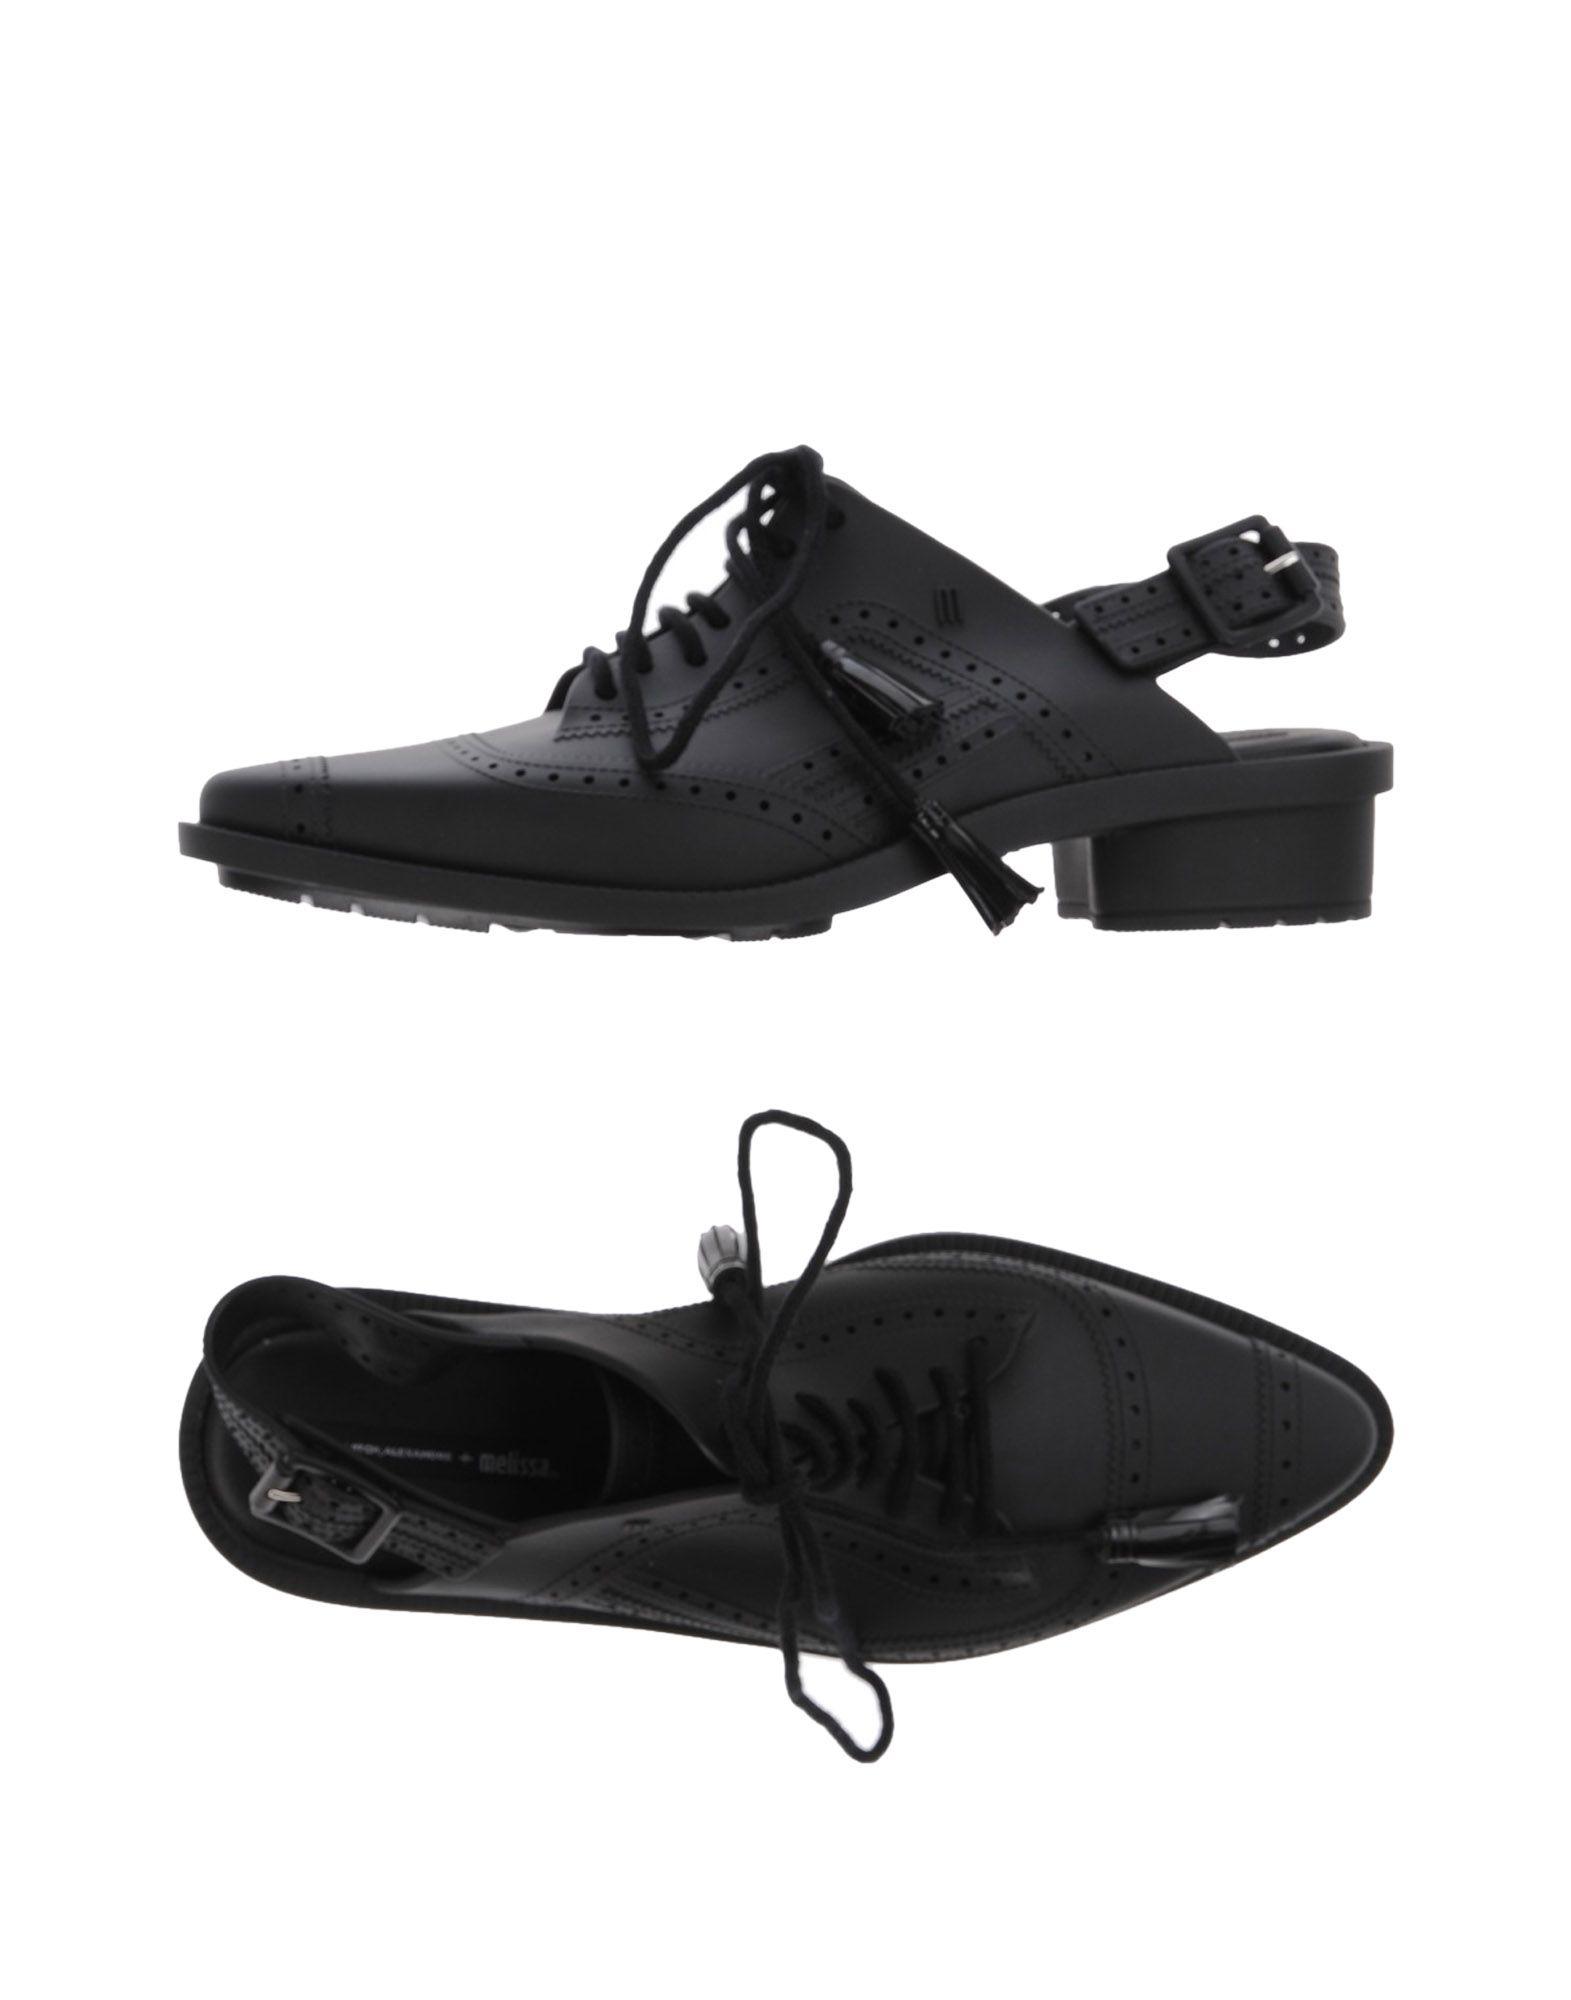 MELISSA + ALEXANDRE HERCHCOVITCH Обувь на шнурках melissa обувь на шнурках